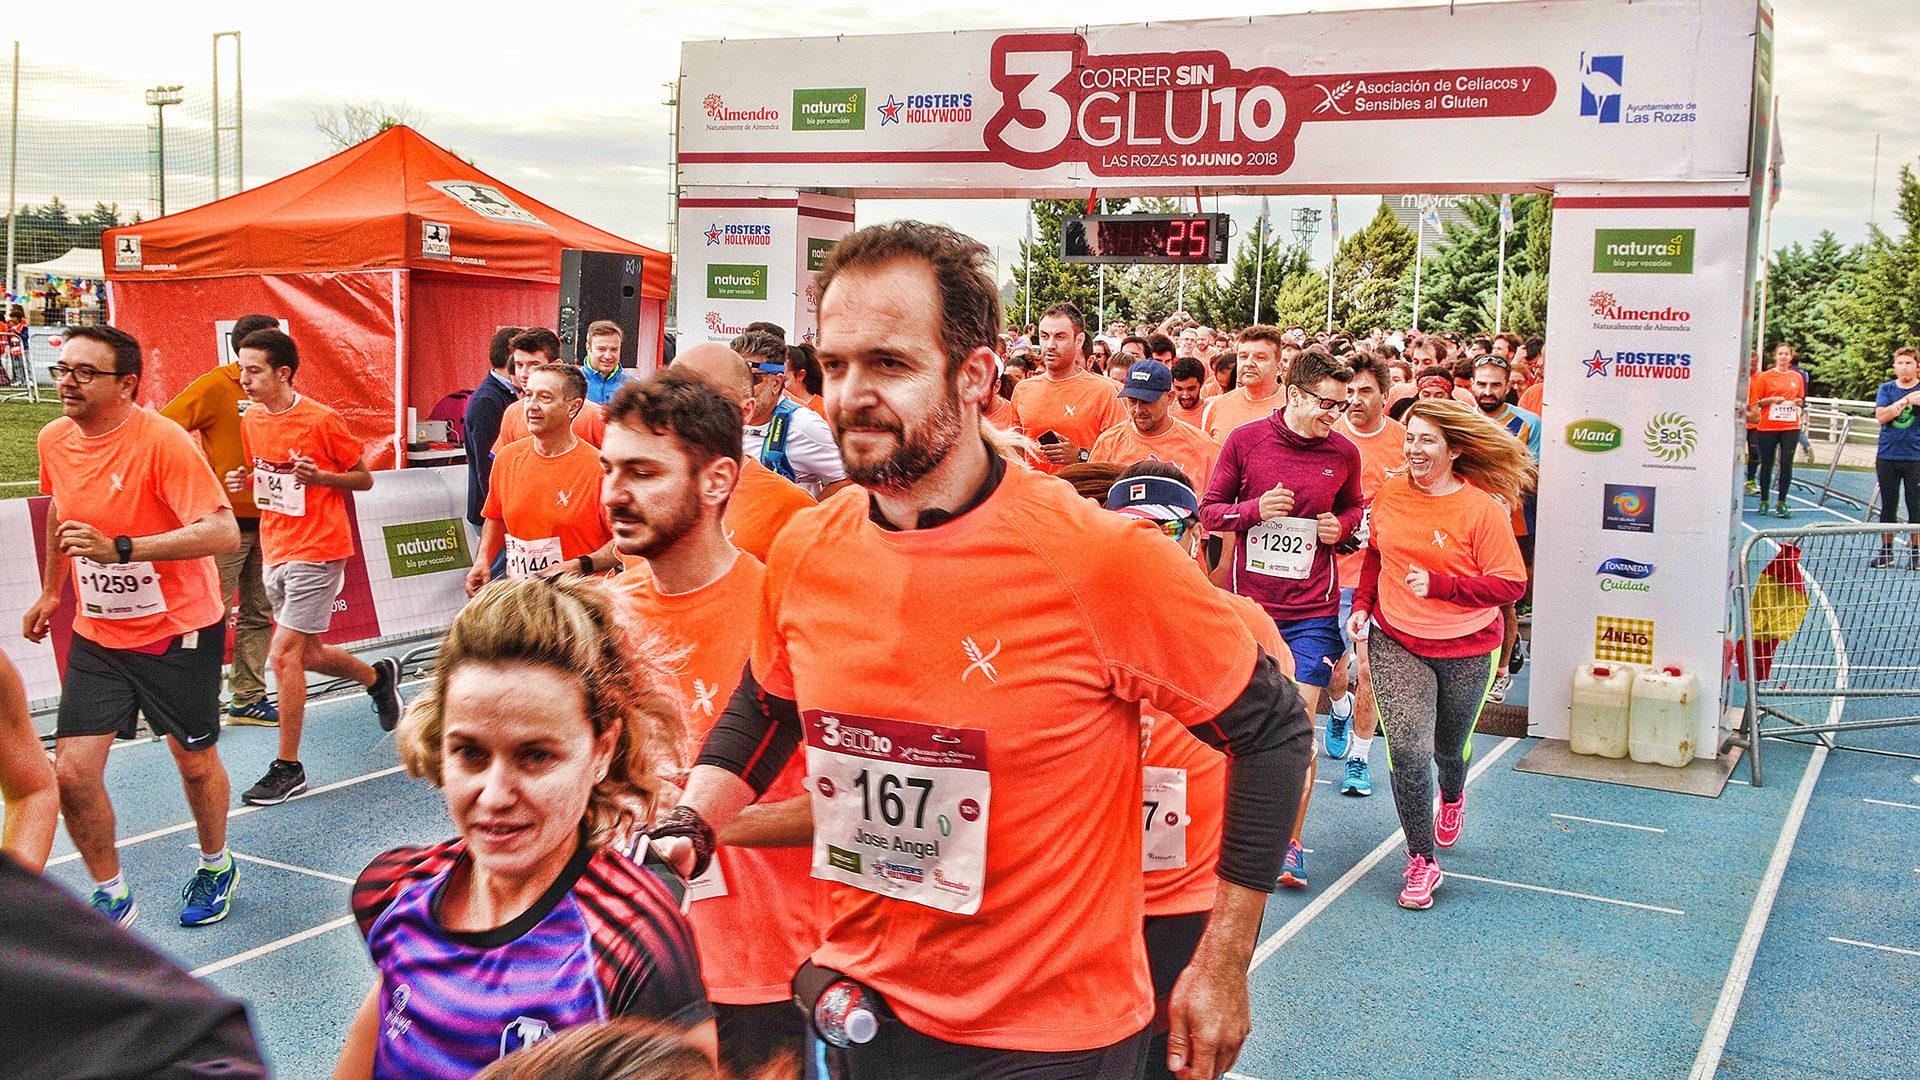 Correr sinGlu10